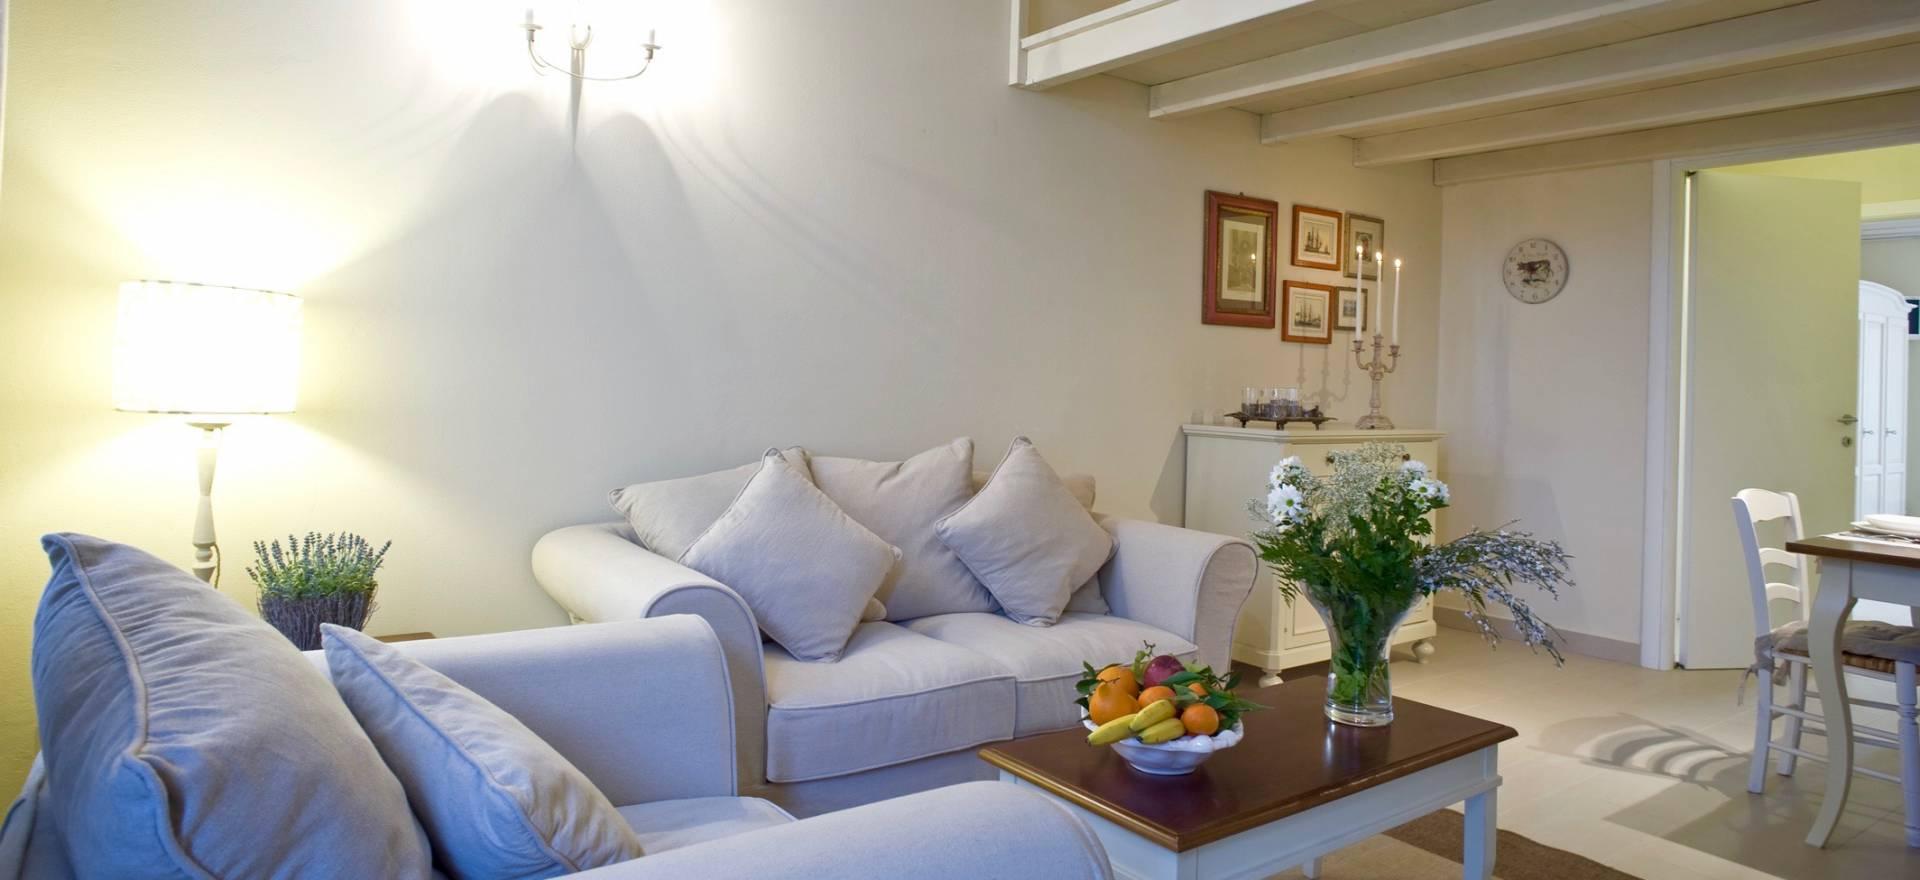 Agriturismo Toscane met sfeervolle familie-appartementen